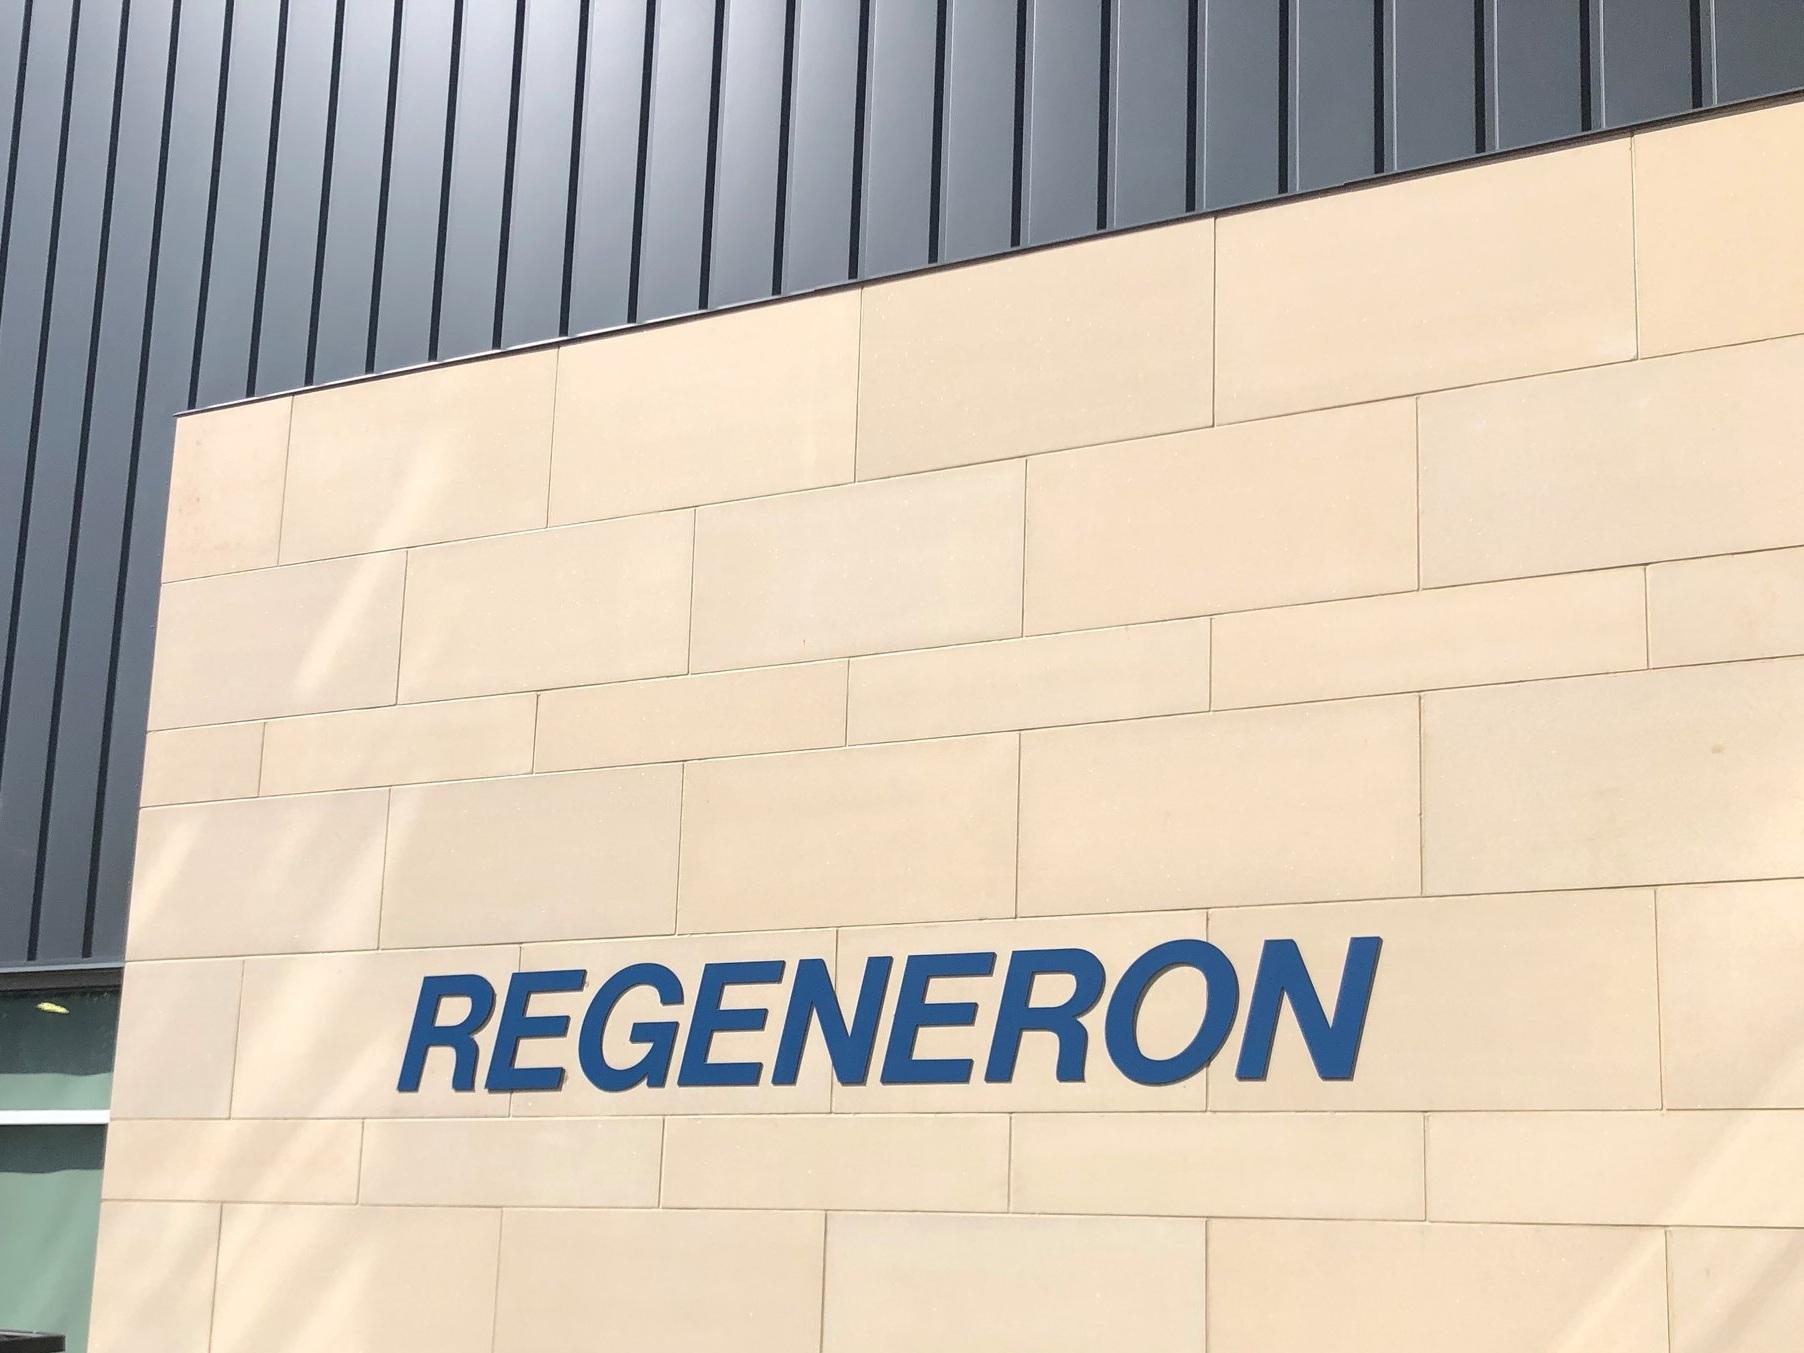 regeneron.jpg